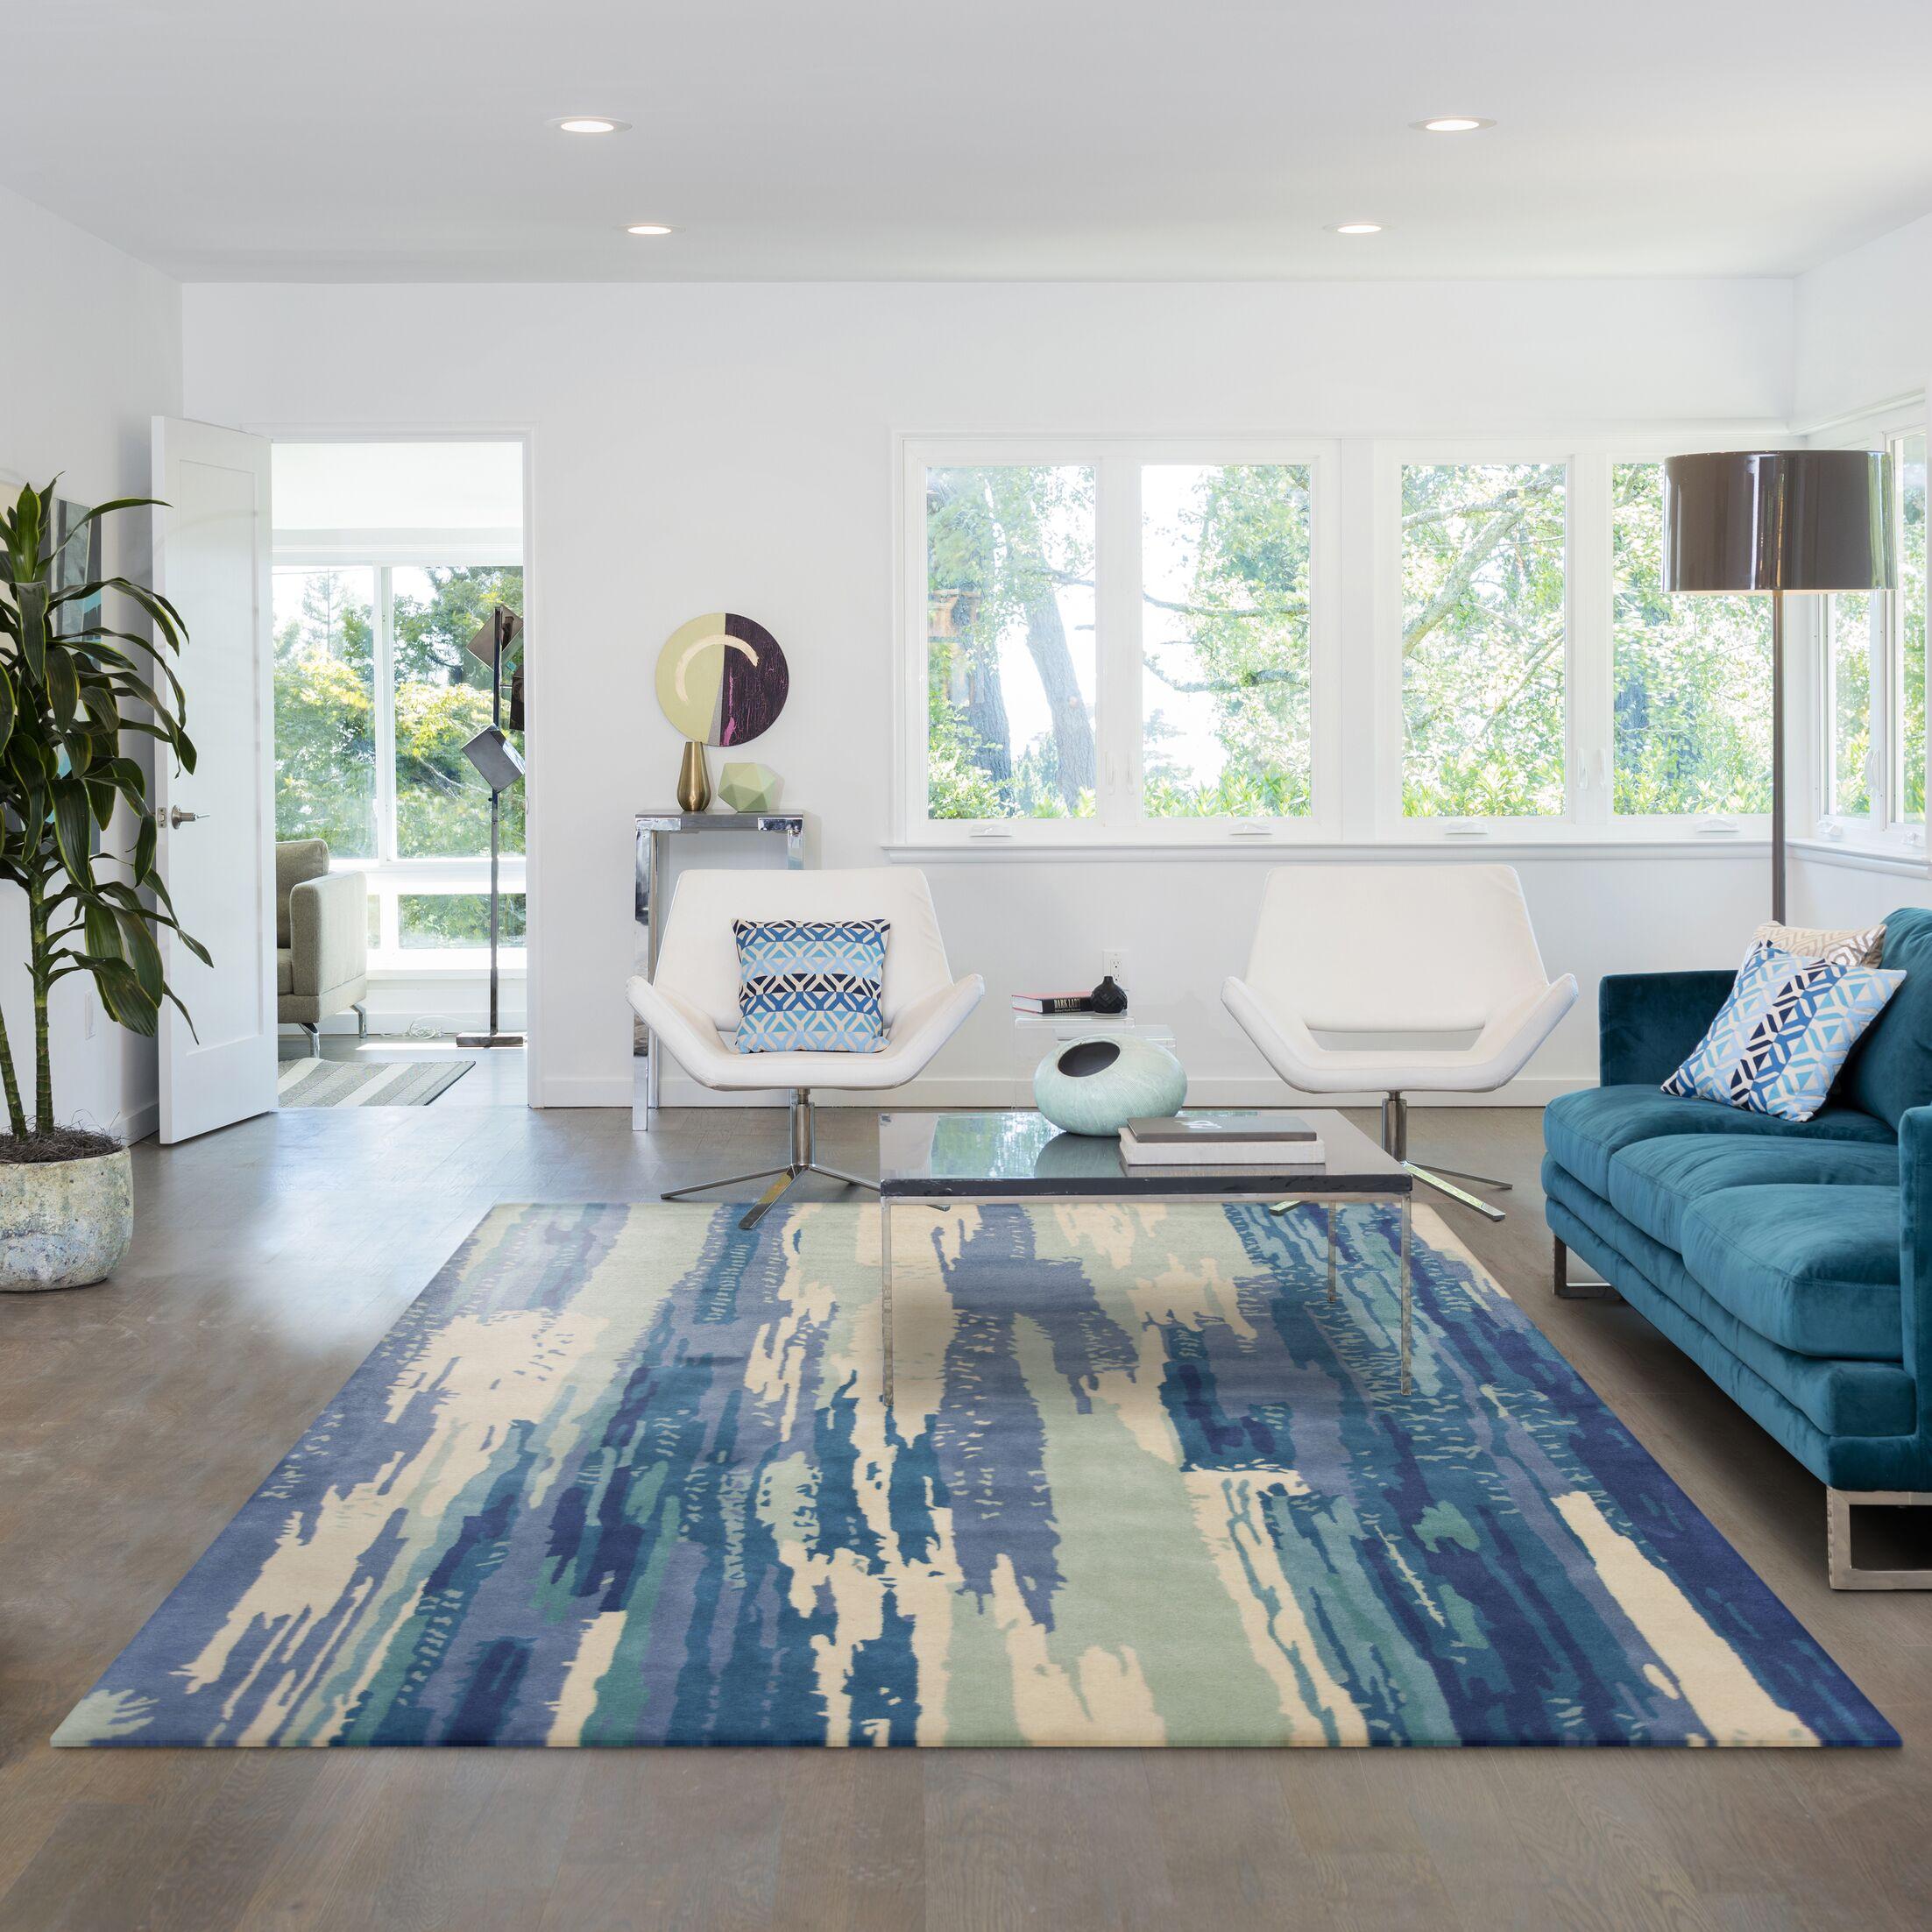 Bernardine Hand-tufted Wool Ivory/Blue Area Rug Rug Size: Rectangle 9' x 13'